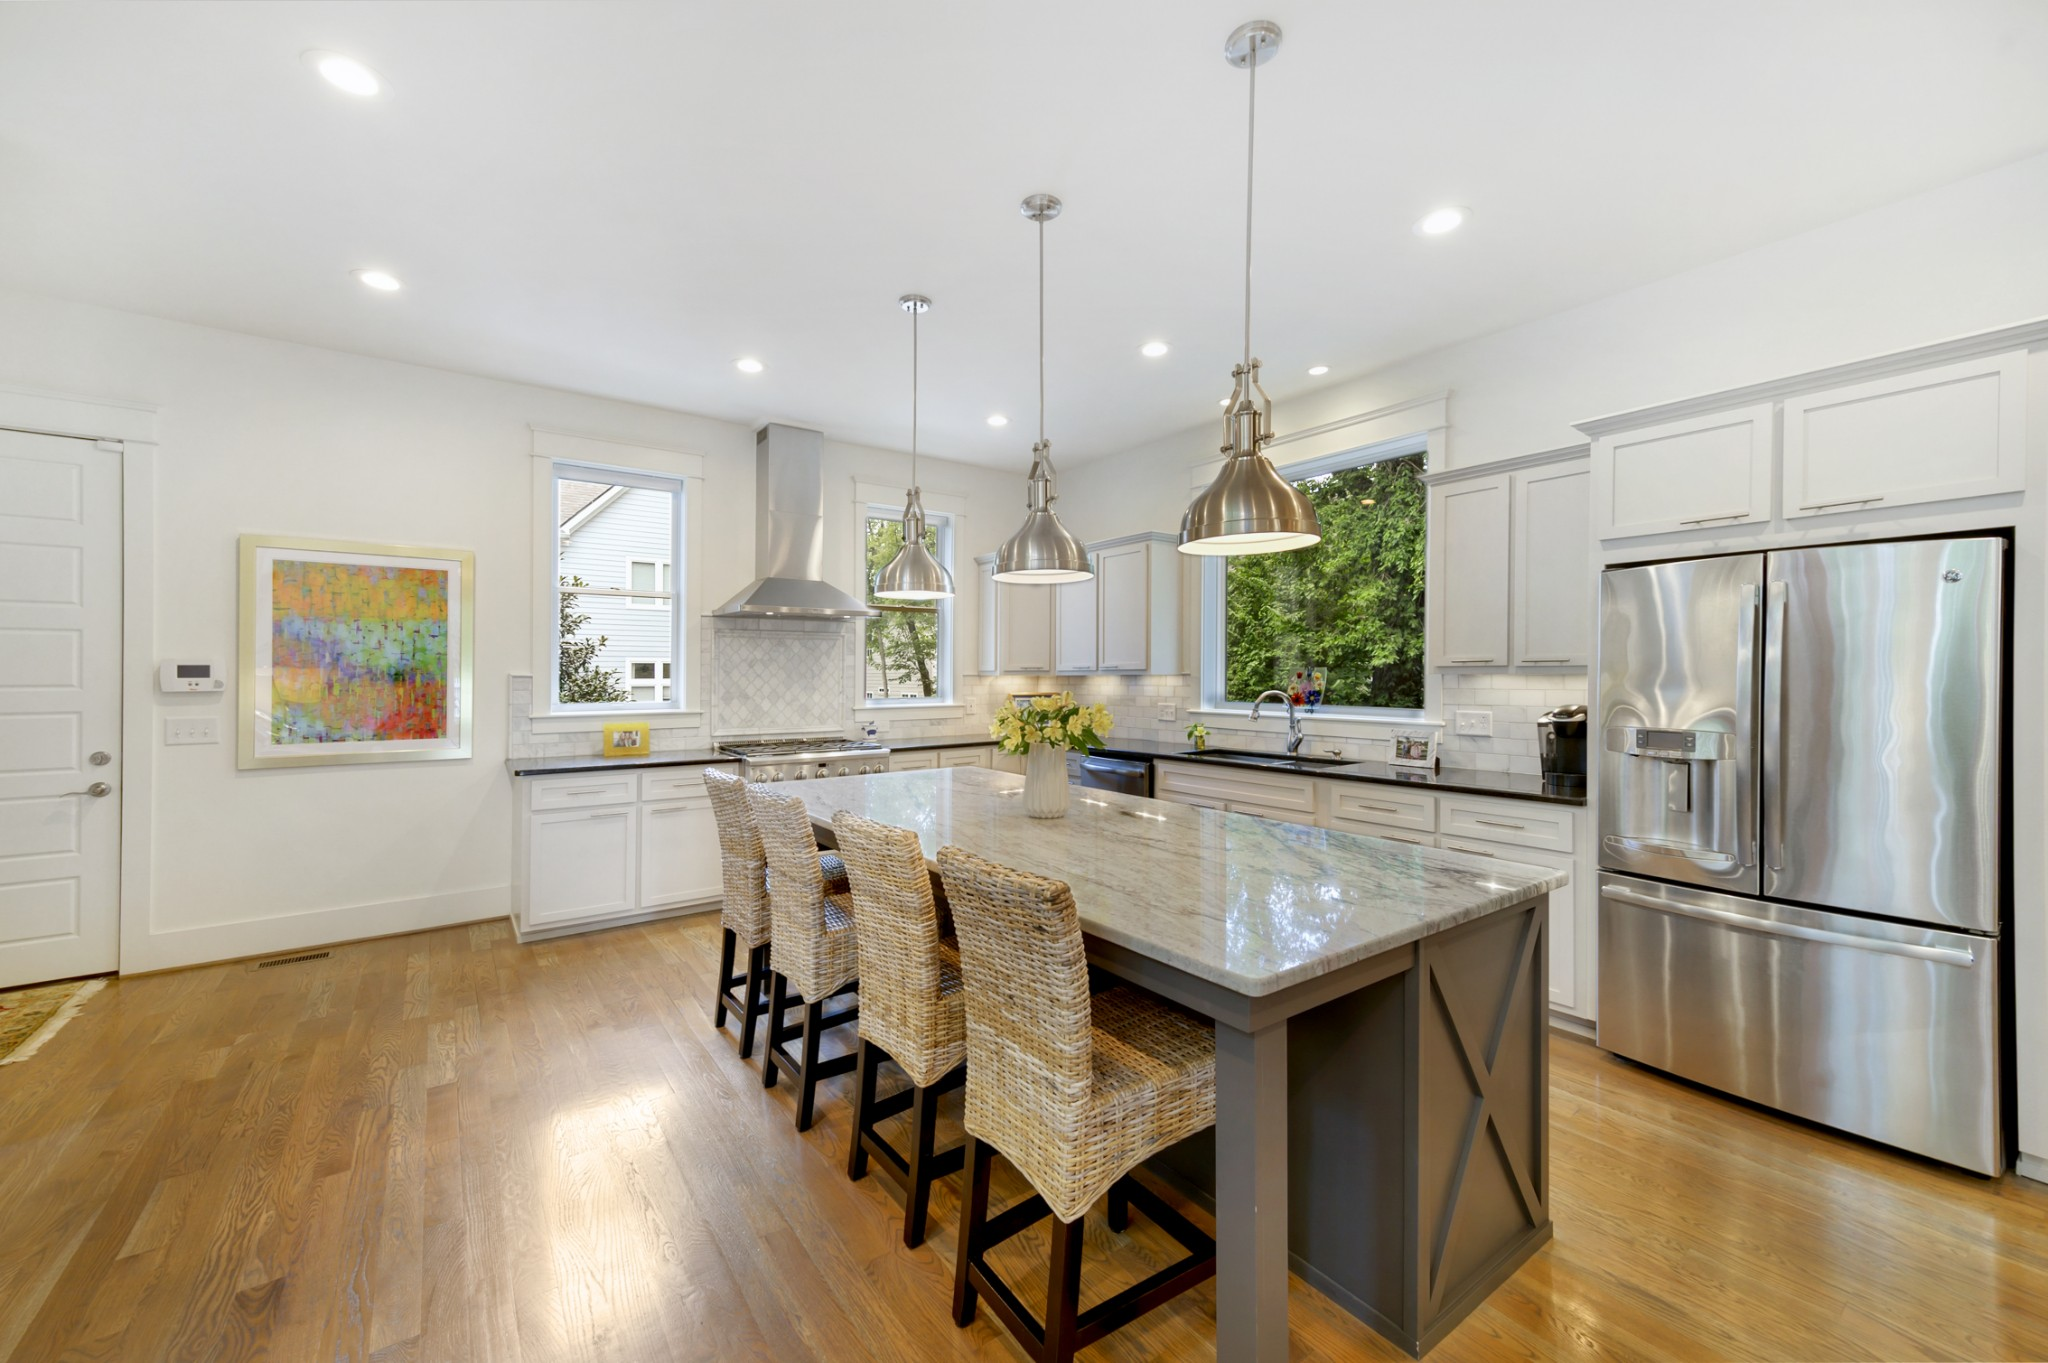 104 Woodmont Cir Property Photo - Nashville, TN real estate listing